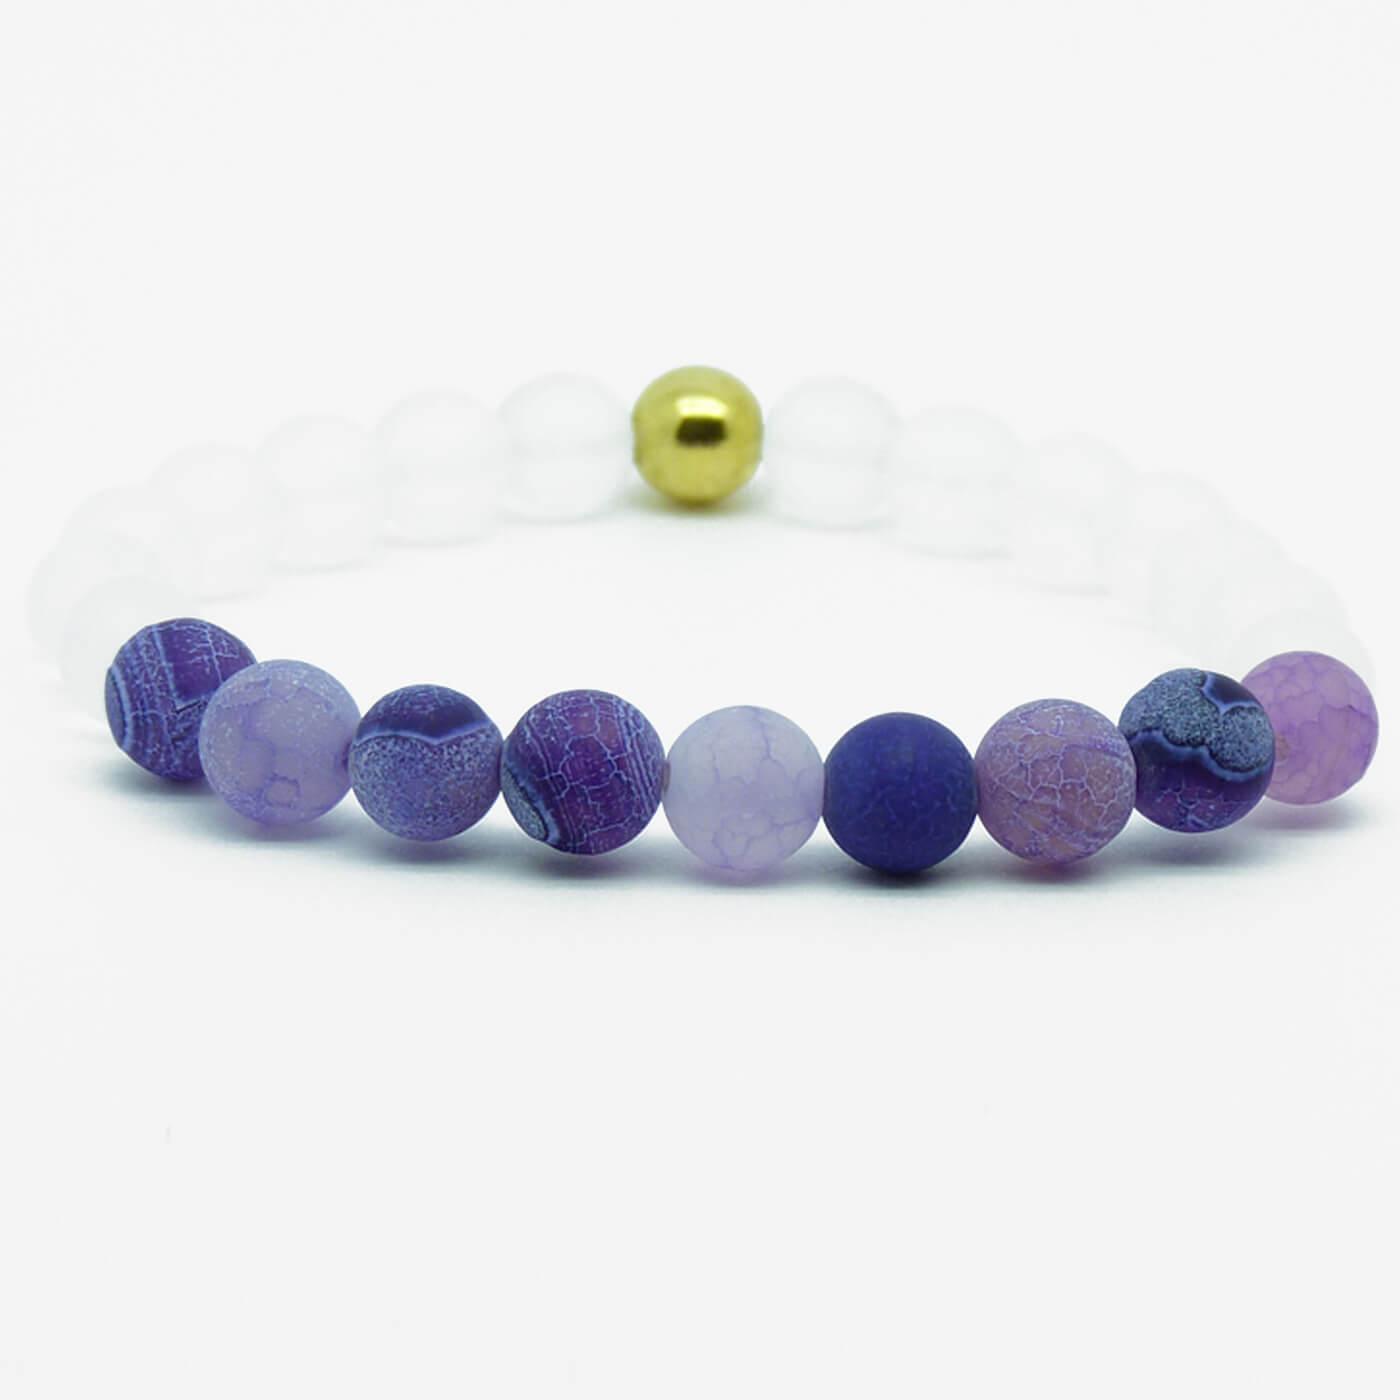 8f4db1992f26ed Summer Vibes Bracelet | White Bead & Blue Weathered Agate Stones ...